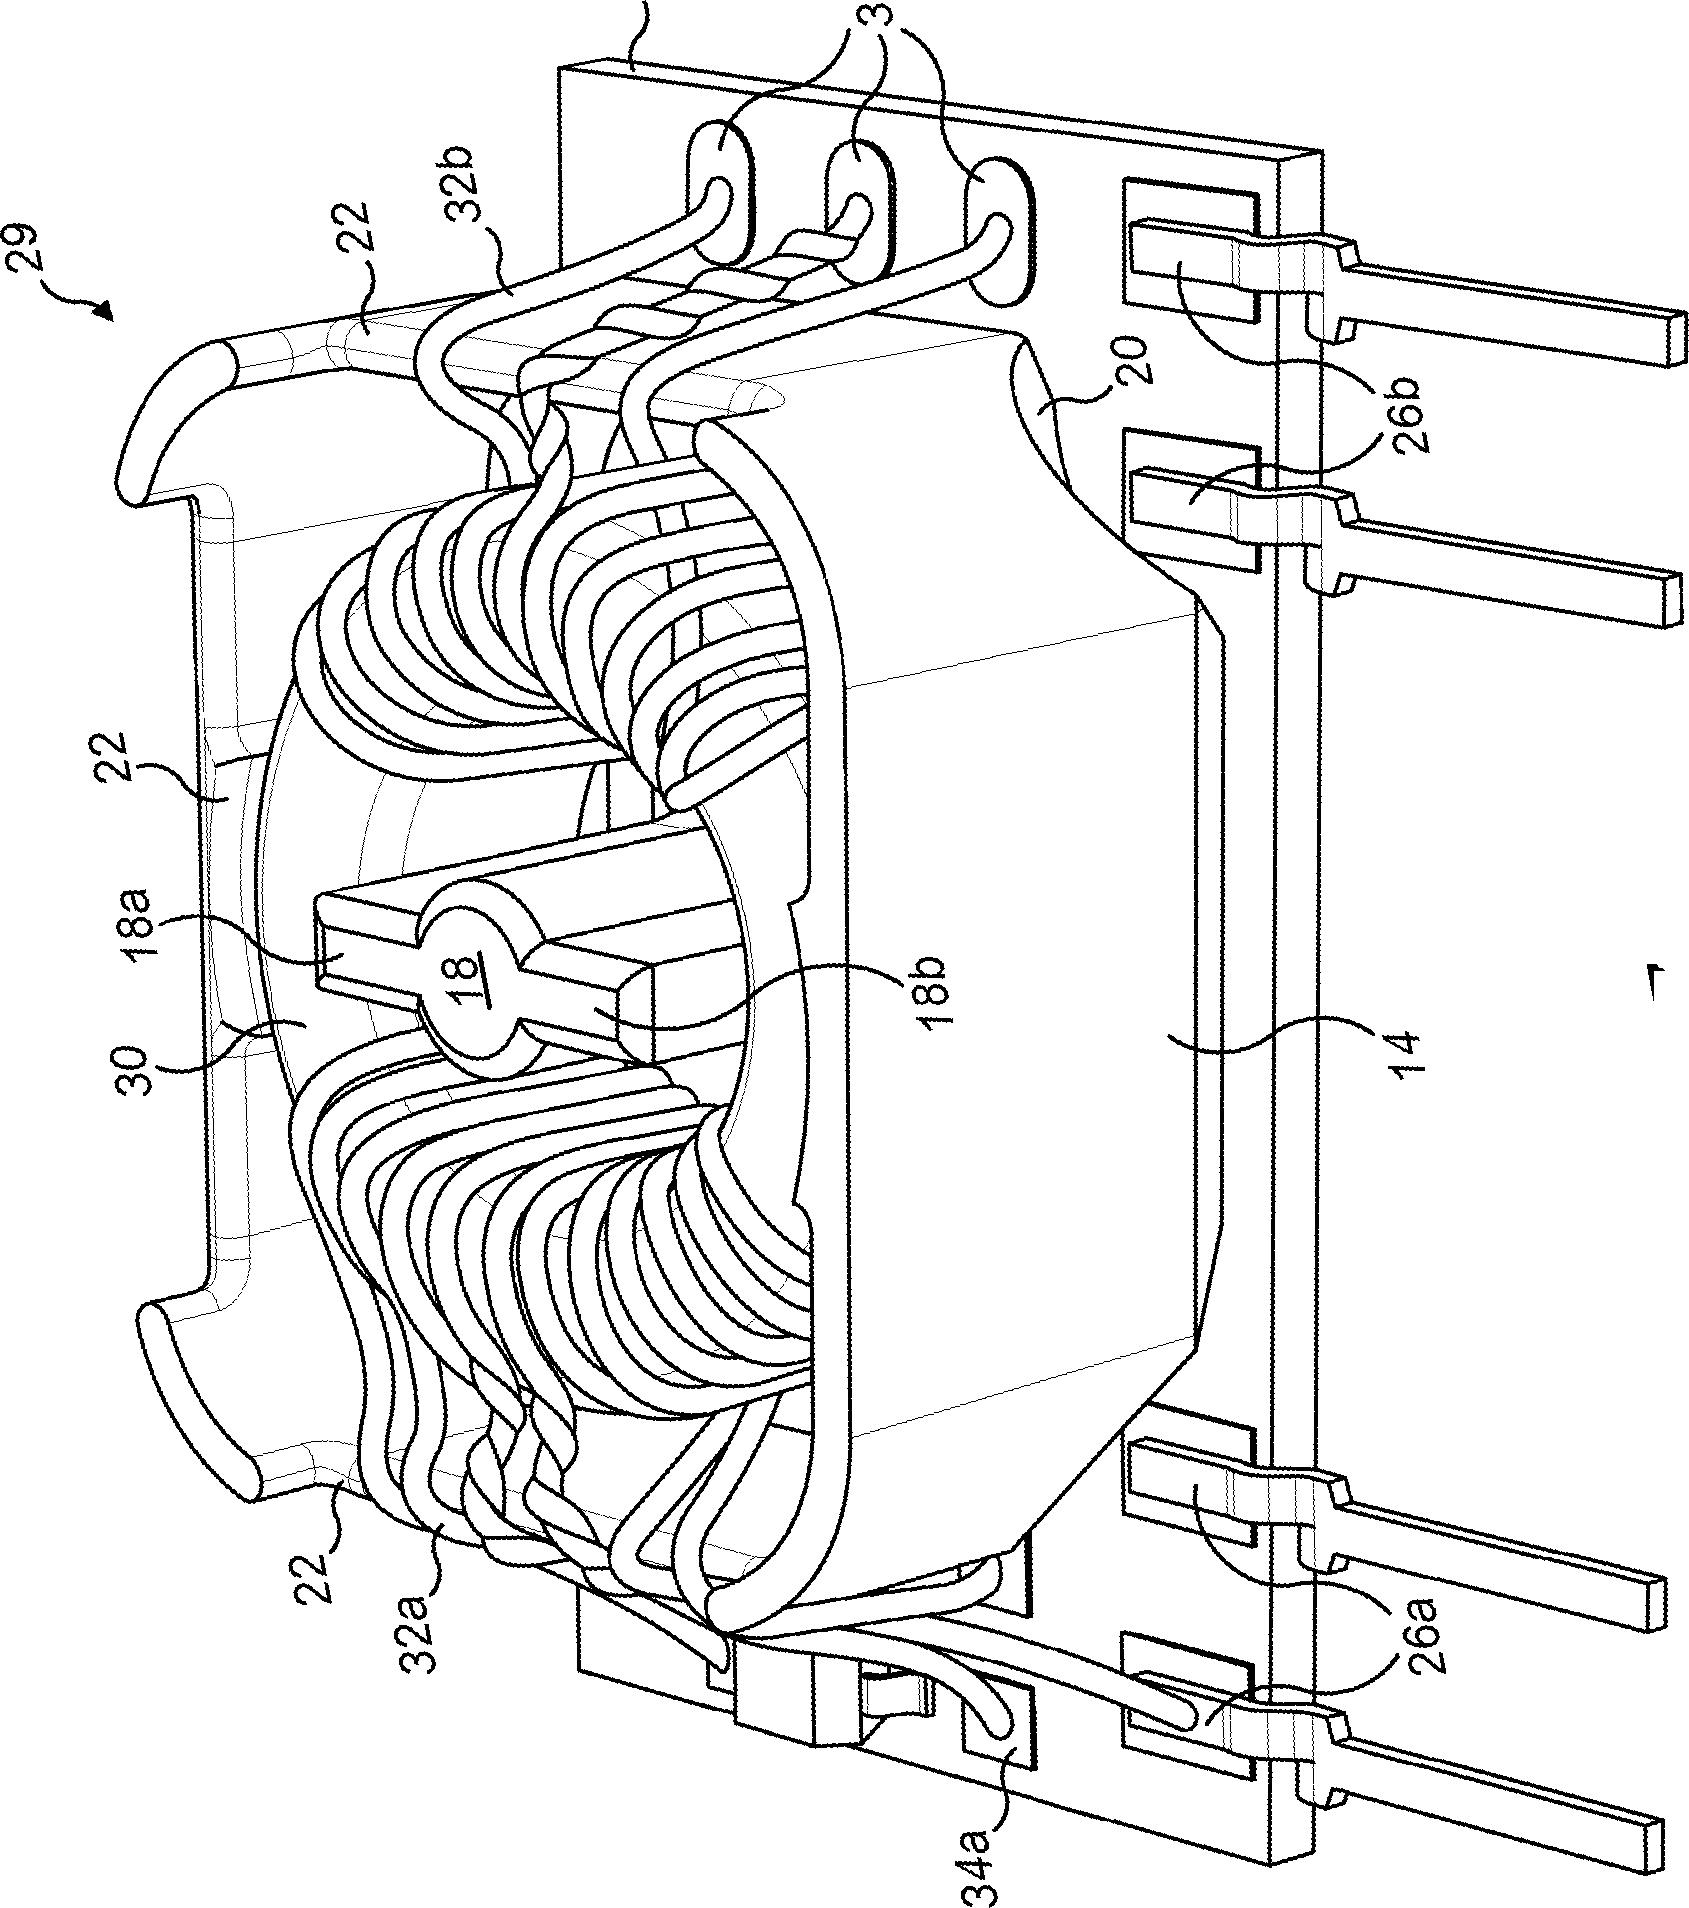 Figure GB2555832A_D0008